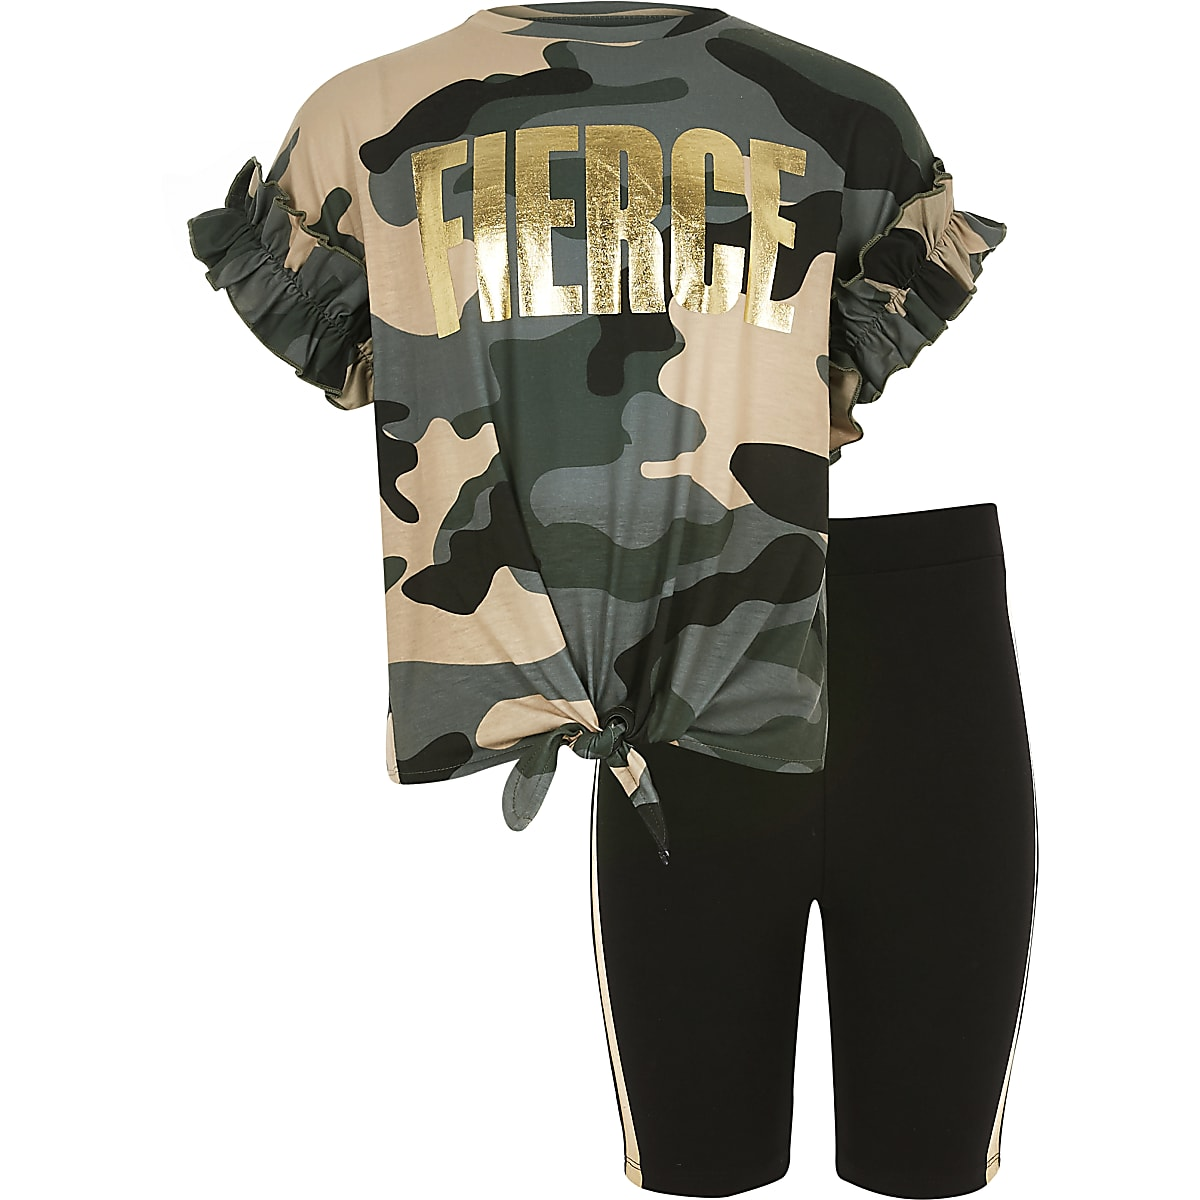 Girls brown 'Fierce' camo T-shirt outfit